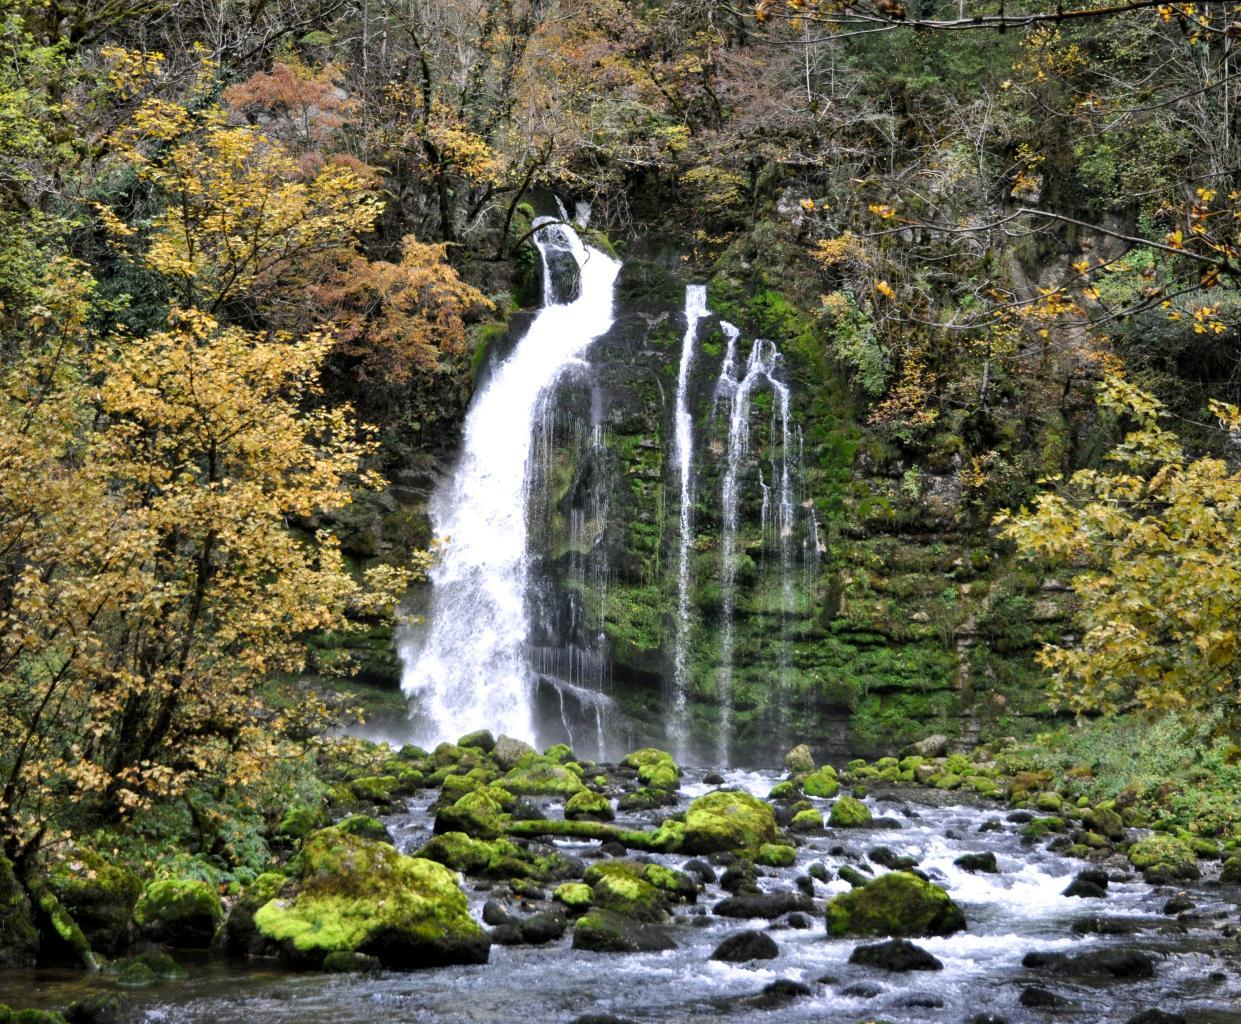 Cascades de Flumen - Jura - Octobre 2016